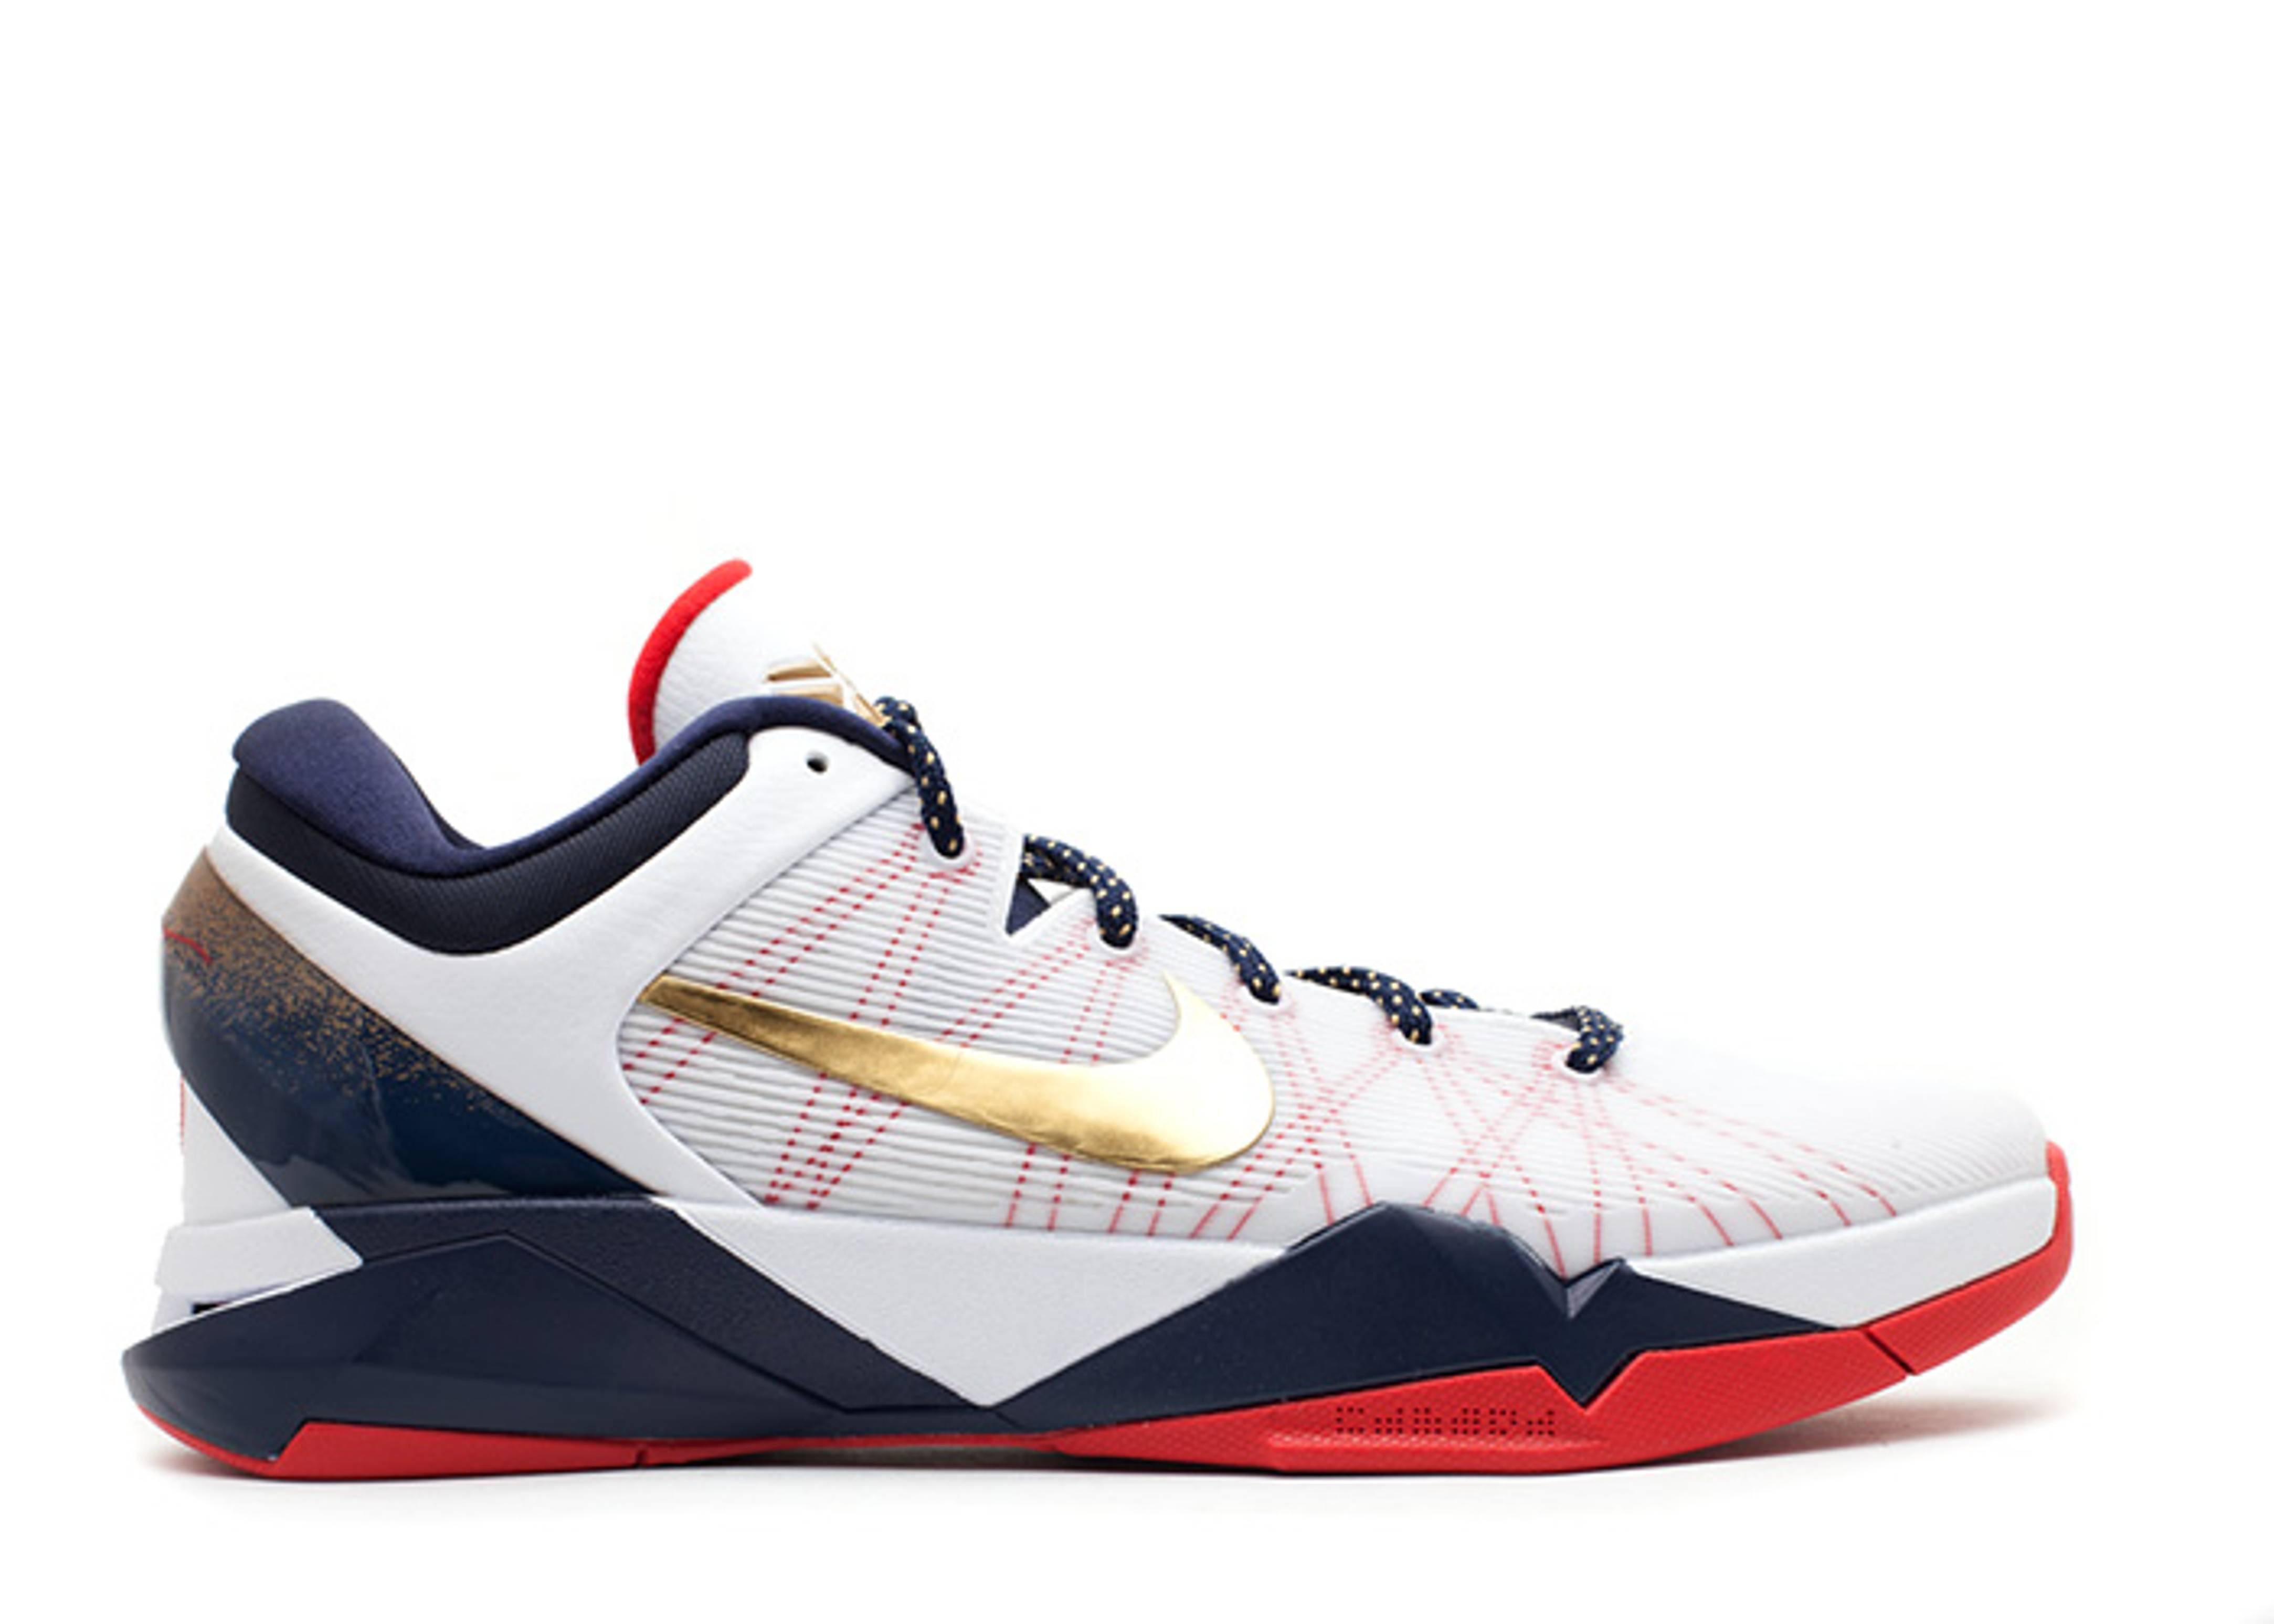 Nike Zoom Kobe 7 VII System White Gold Medal